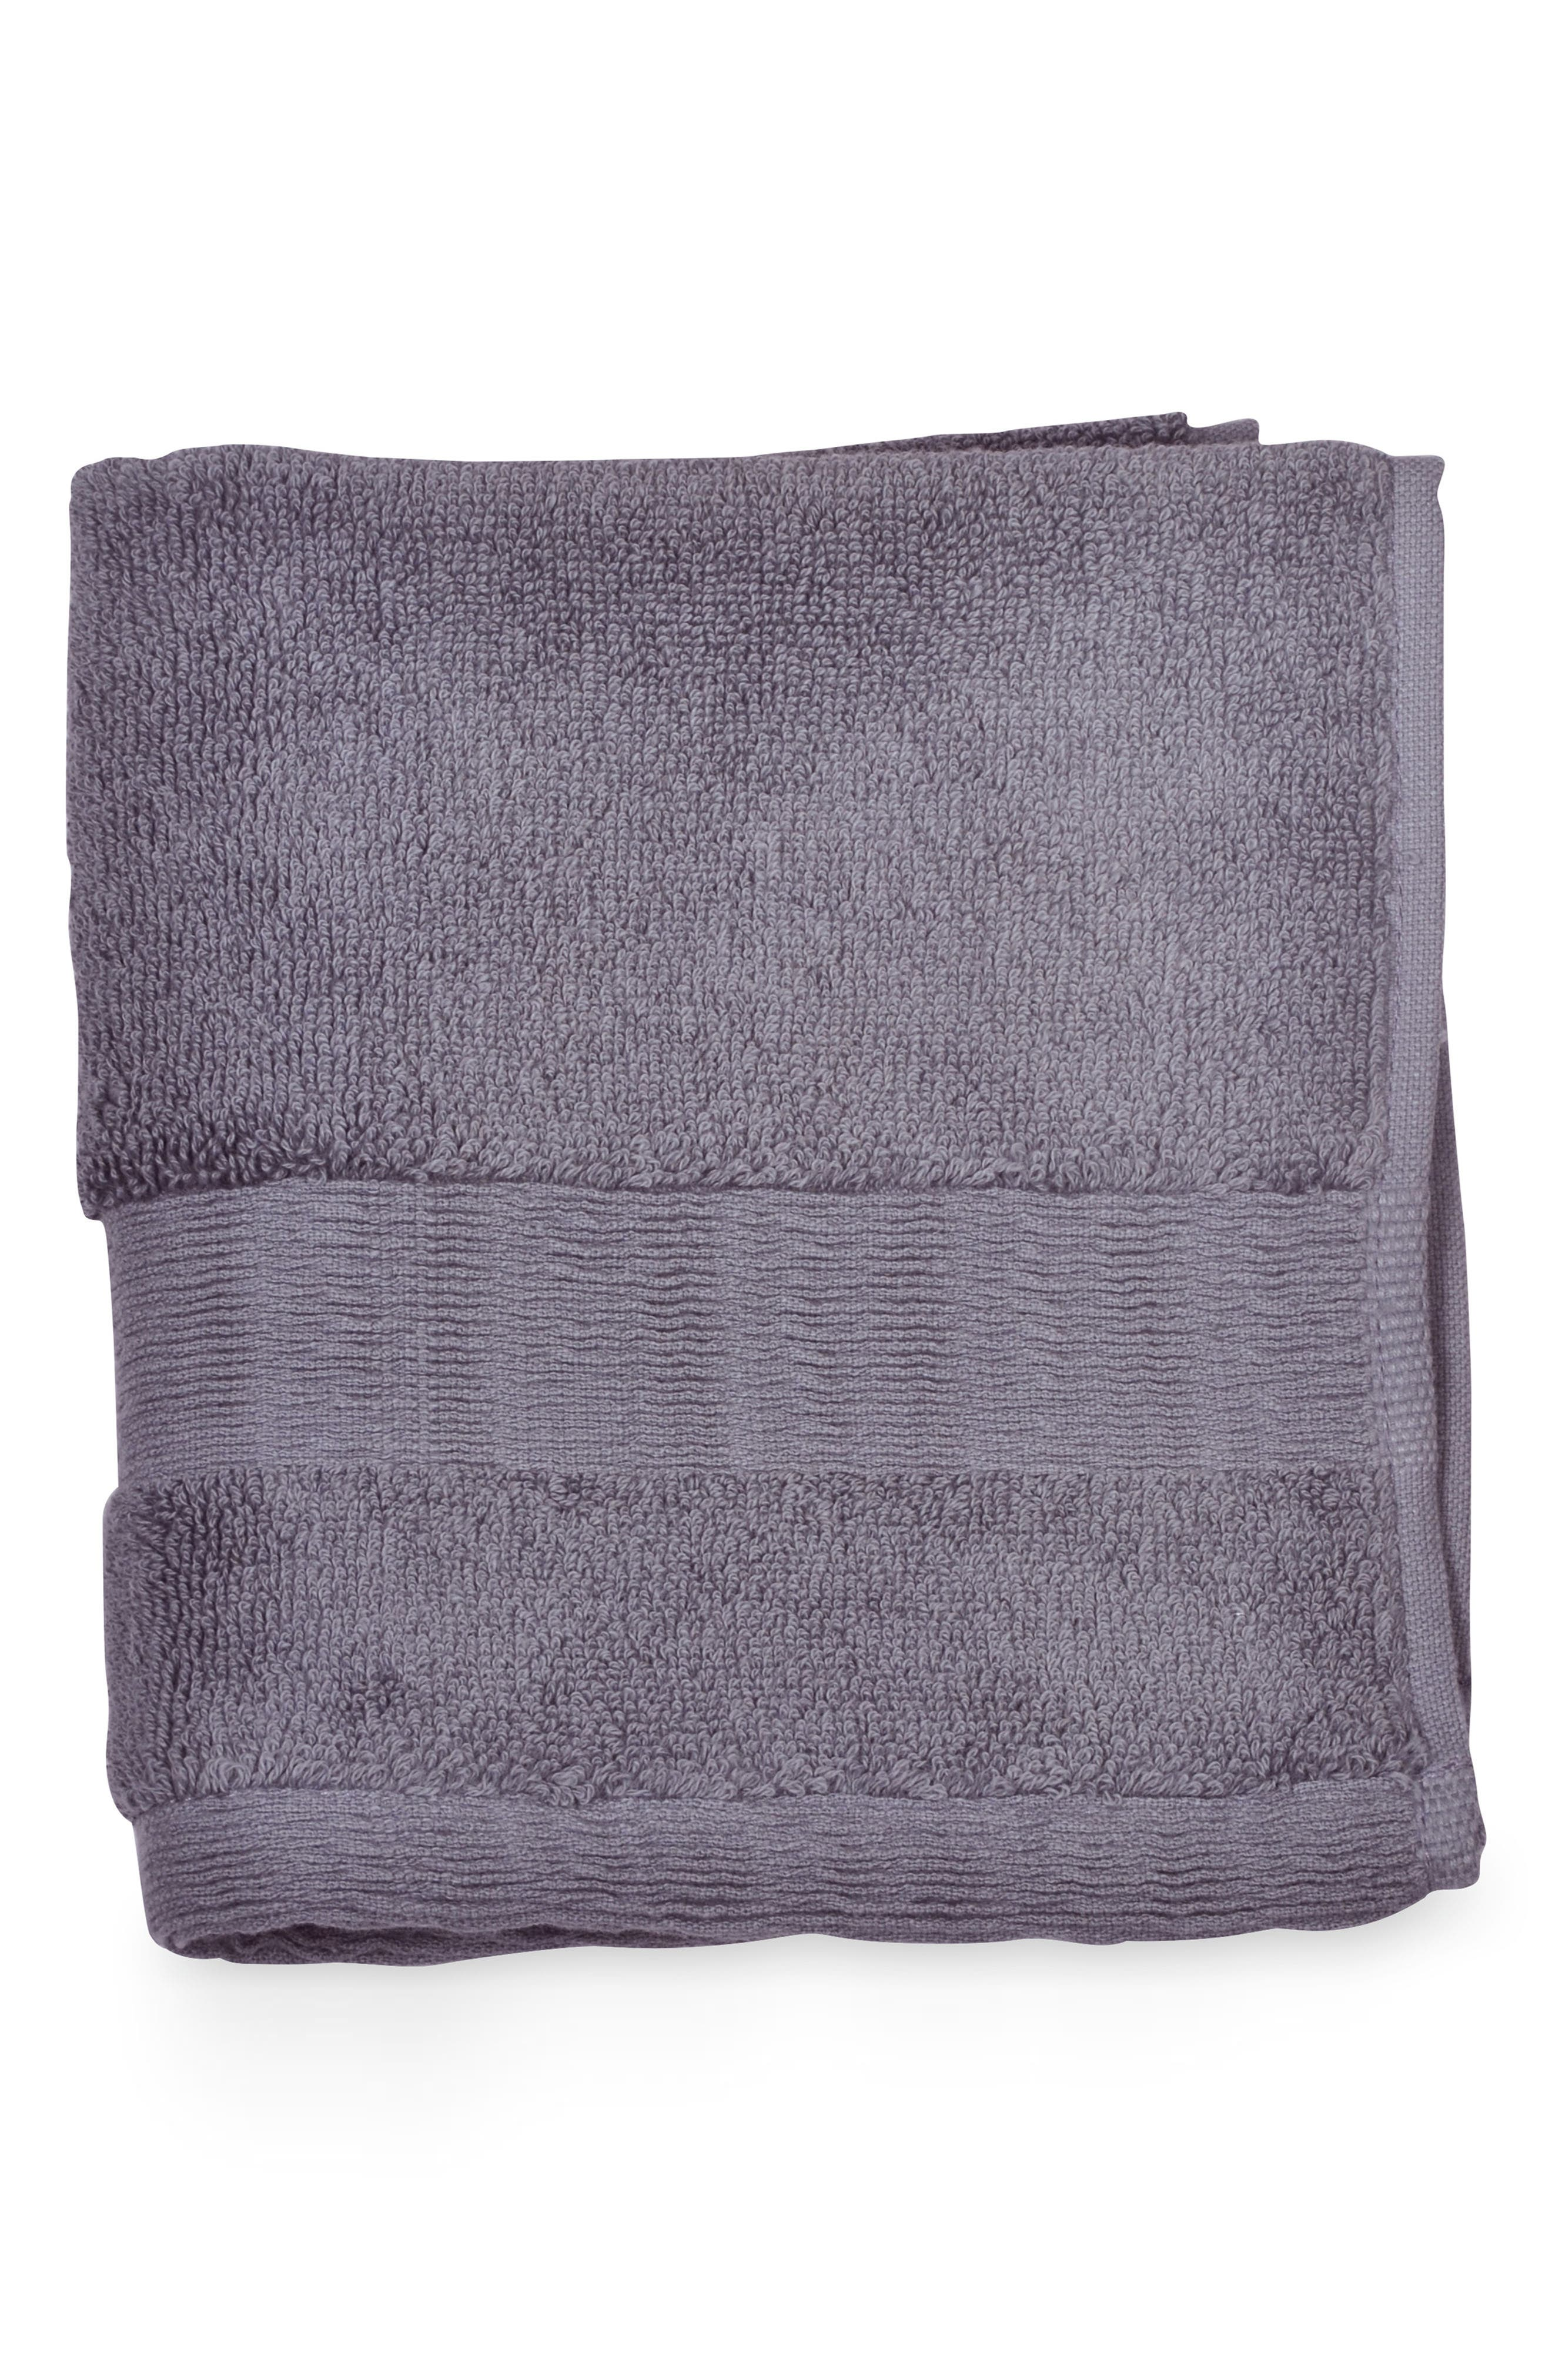 Mercer Washcloth,                         Main,                         color, Dusty Lavender